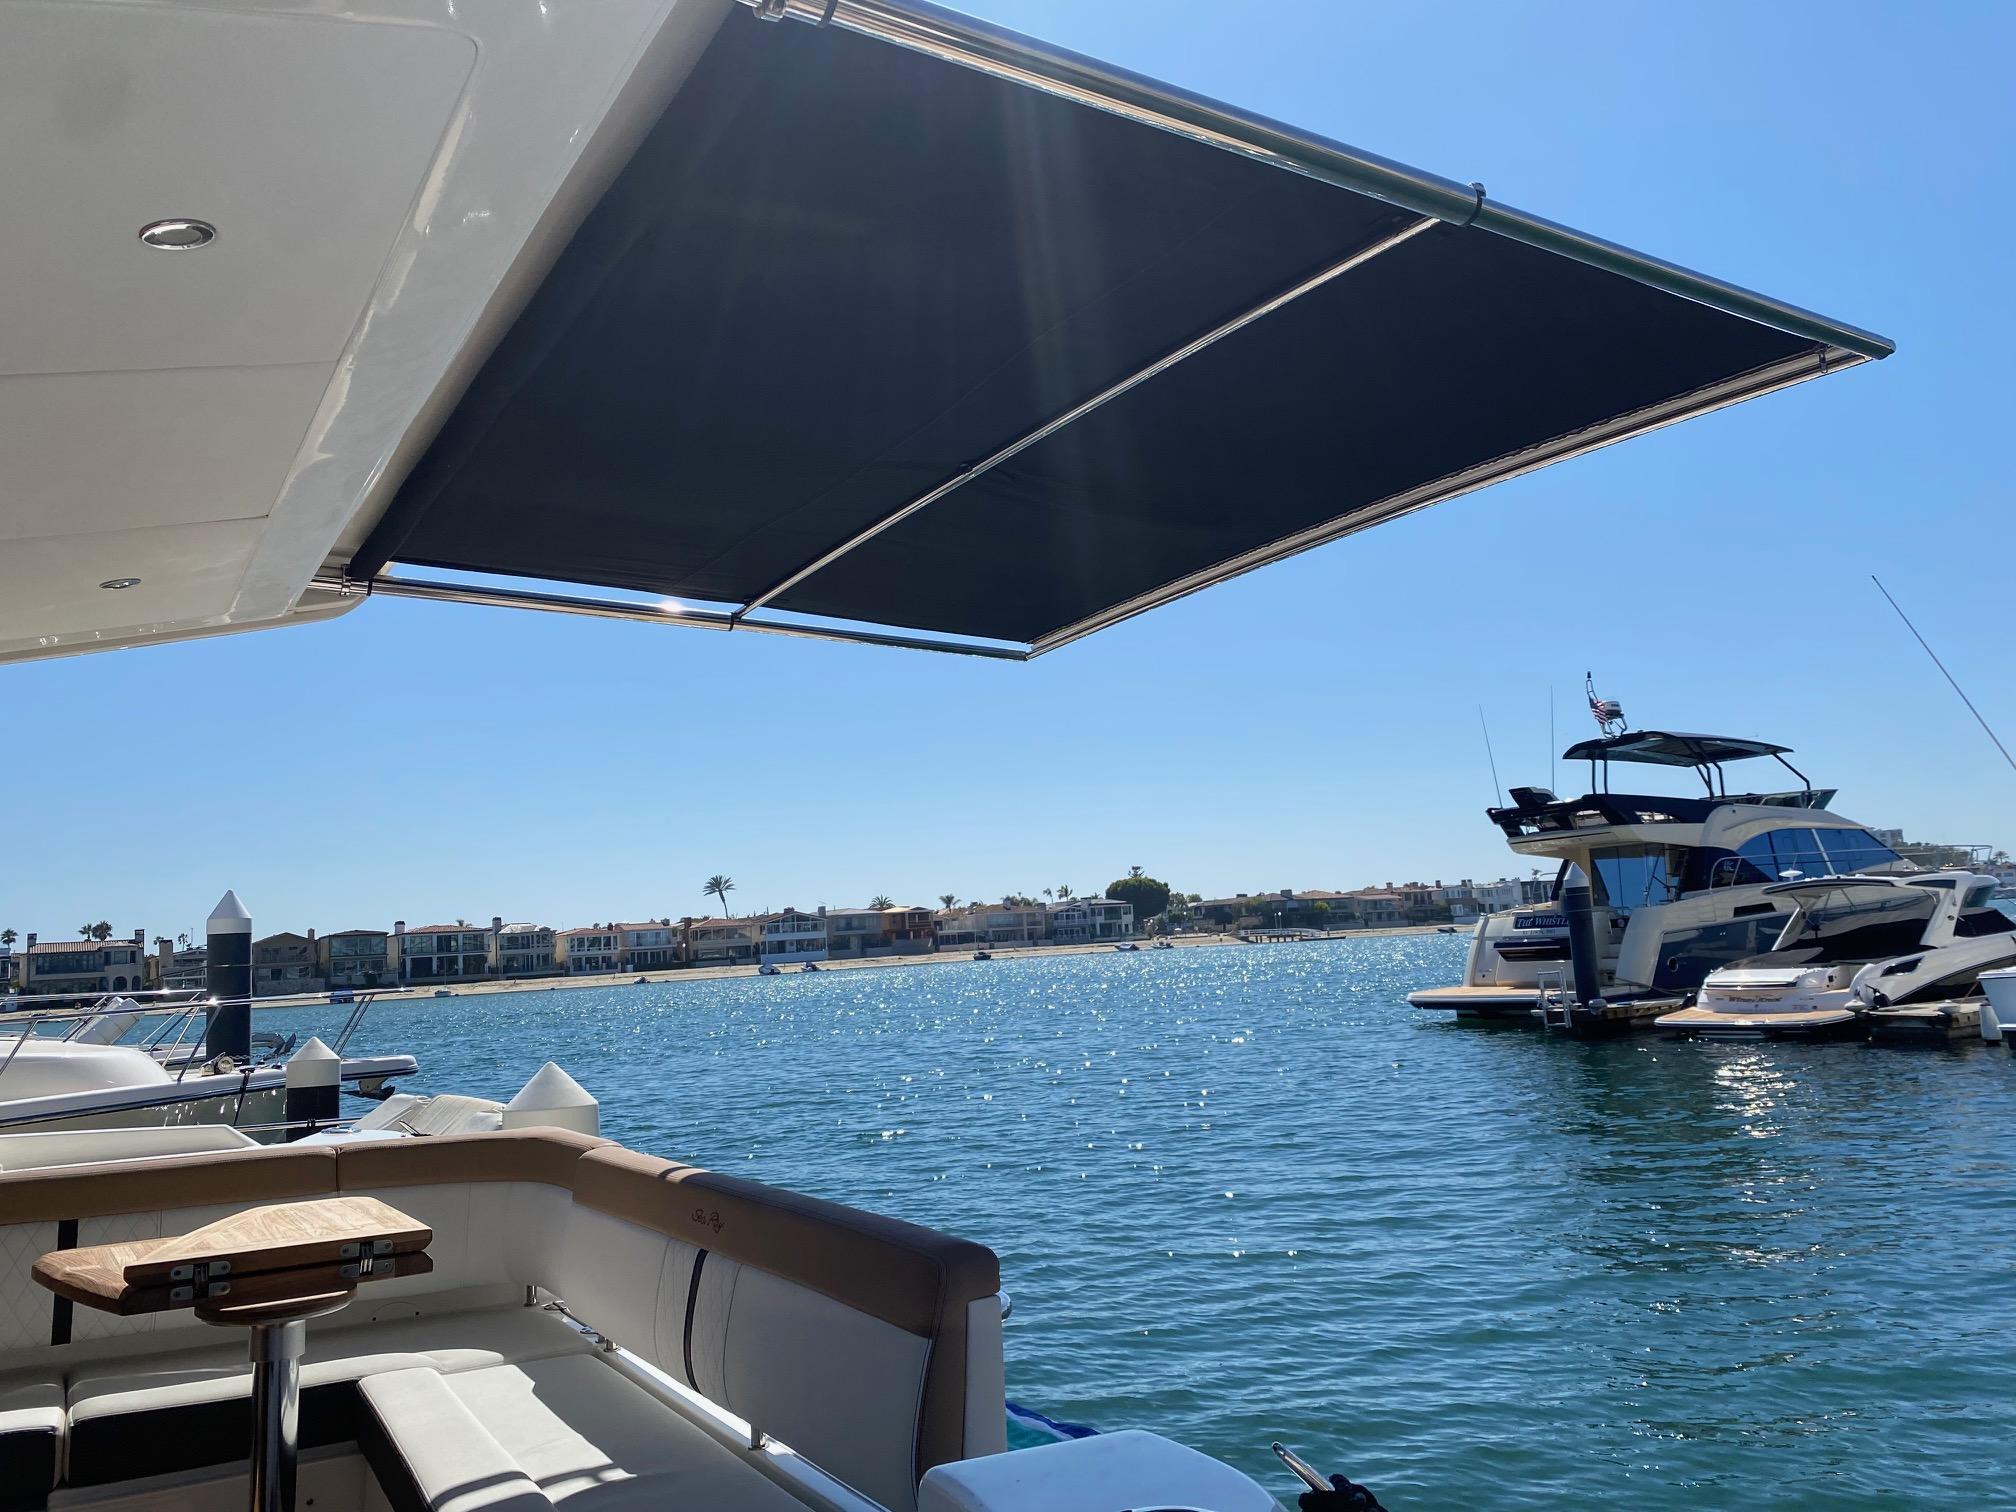 2017 Sea Ray Sundancer 400 #TB8885JP inventory image at Sun Country Coastal in Newport Beach